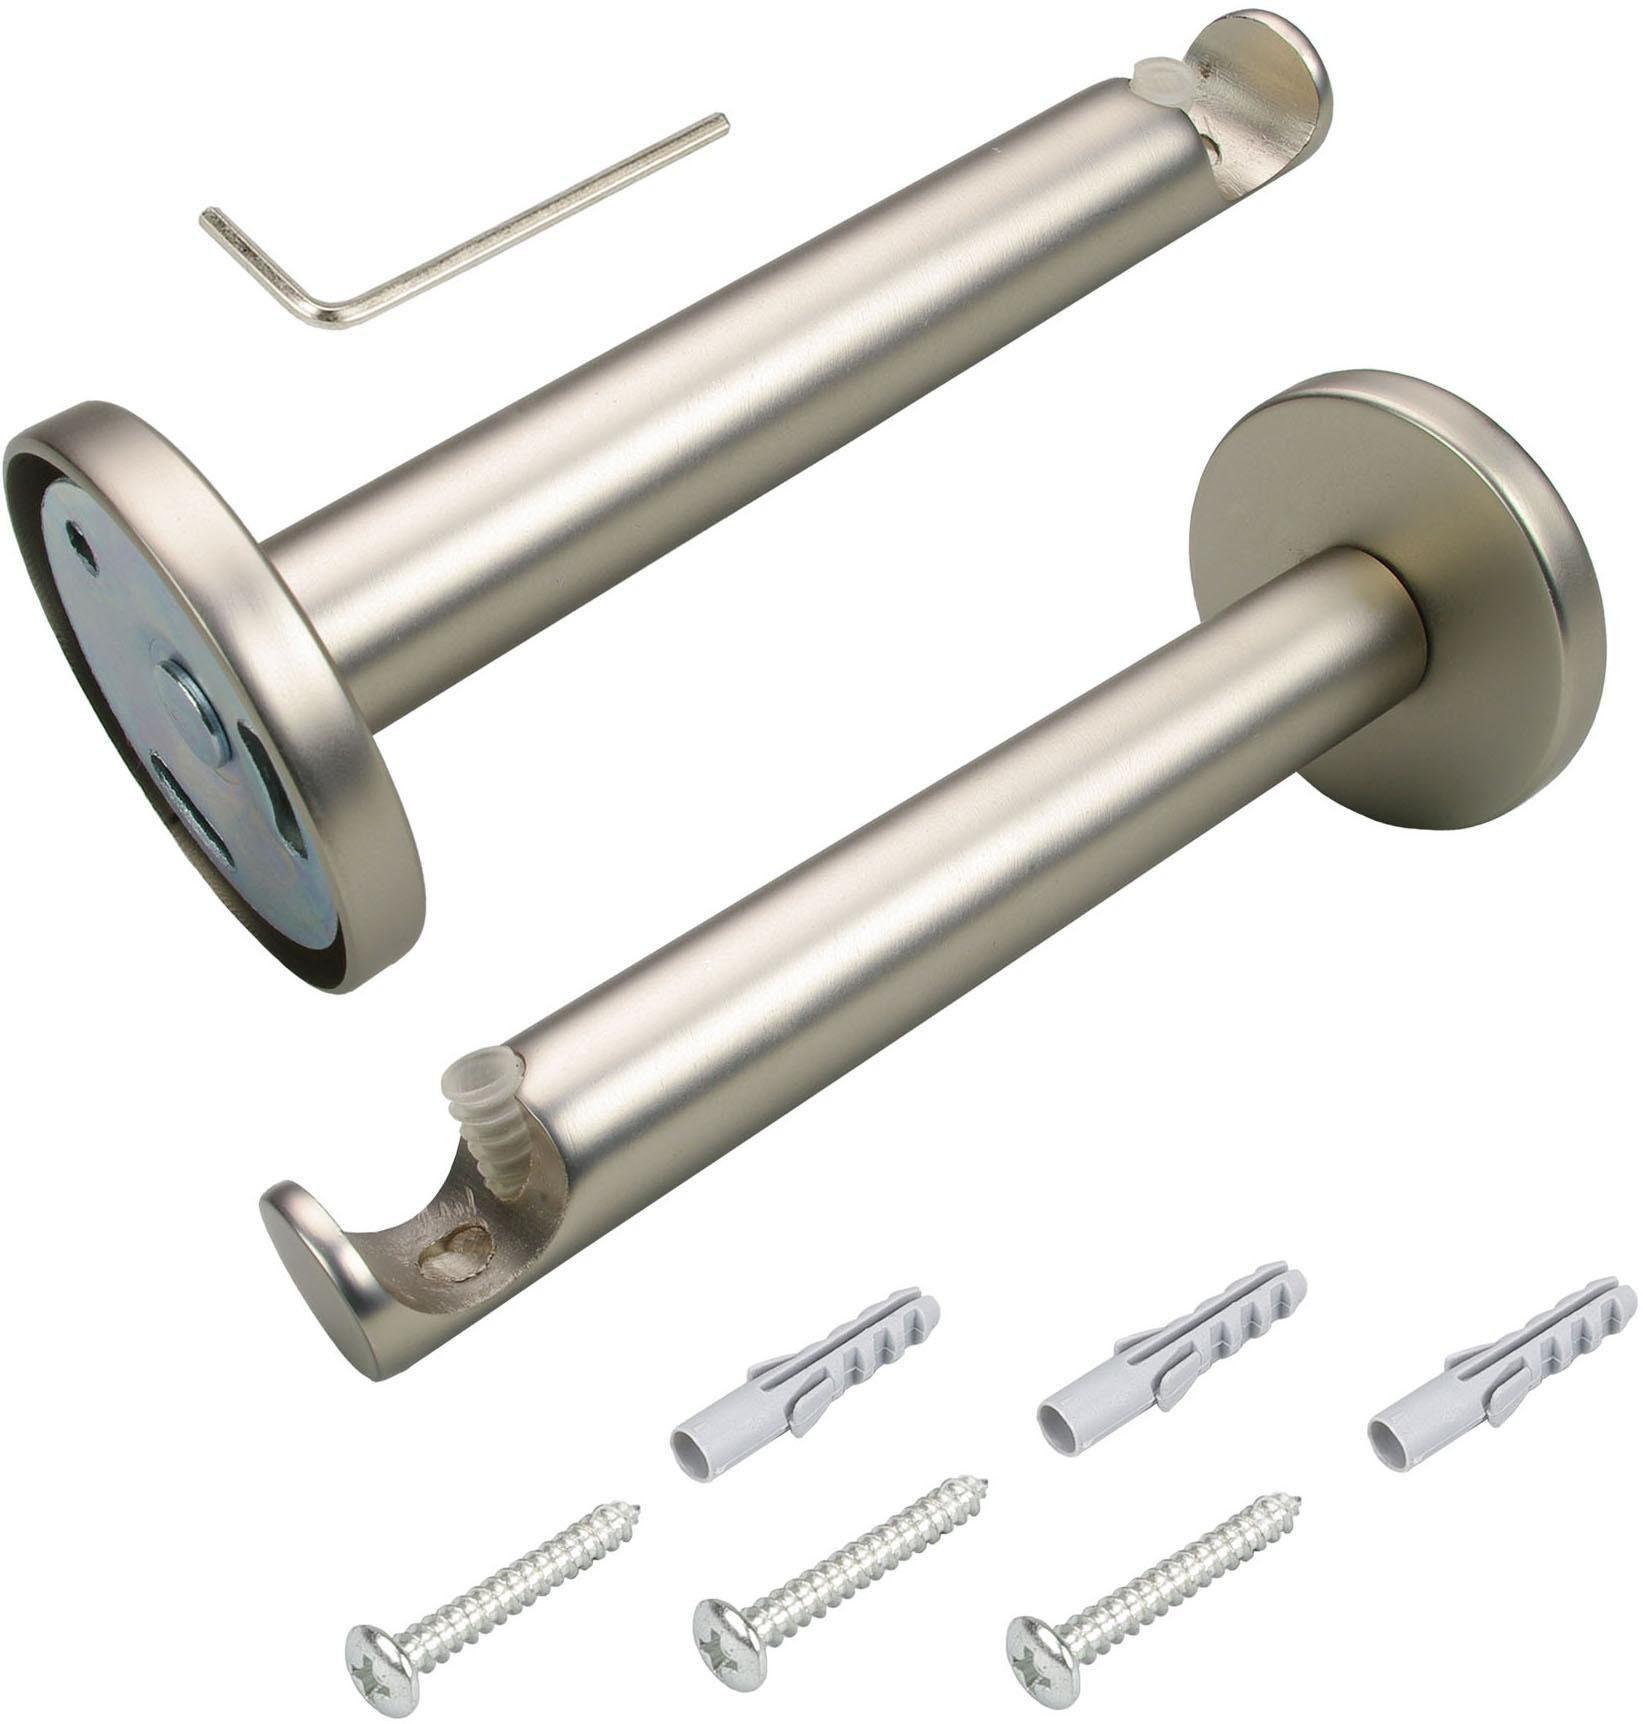 1 Stck.Wandträger Träger für Gardinenstange 20 mm 1 läufig chrom NEU